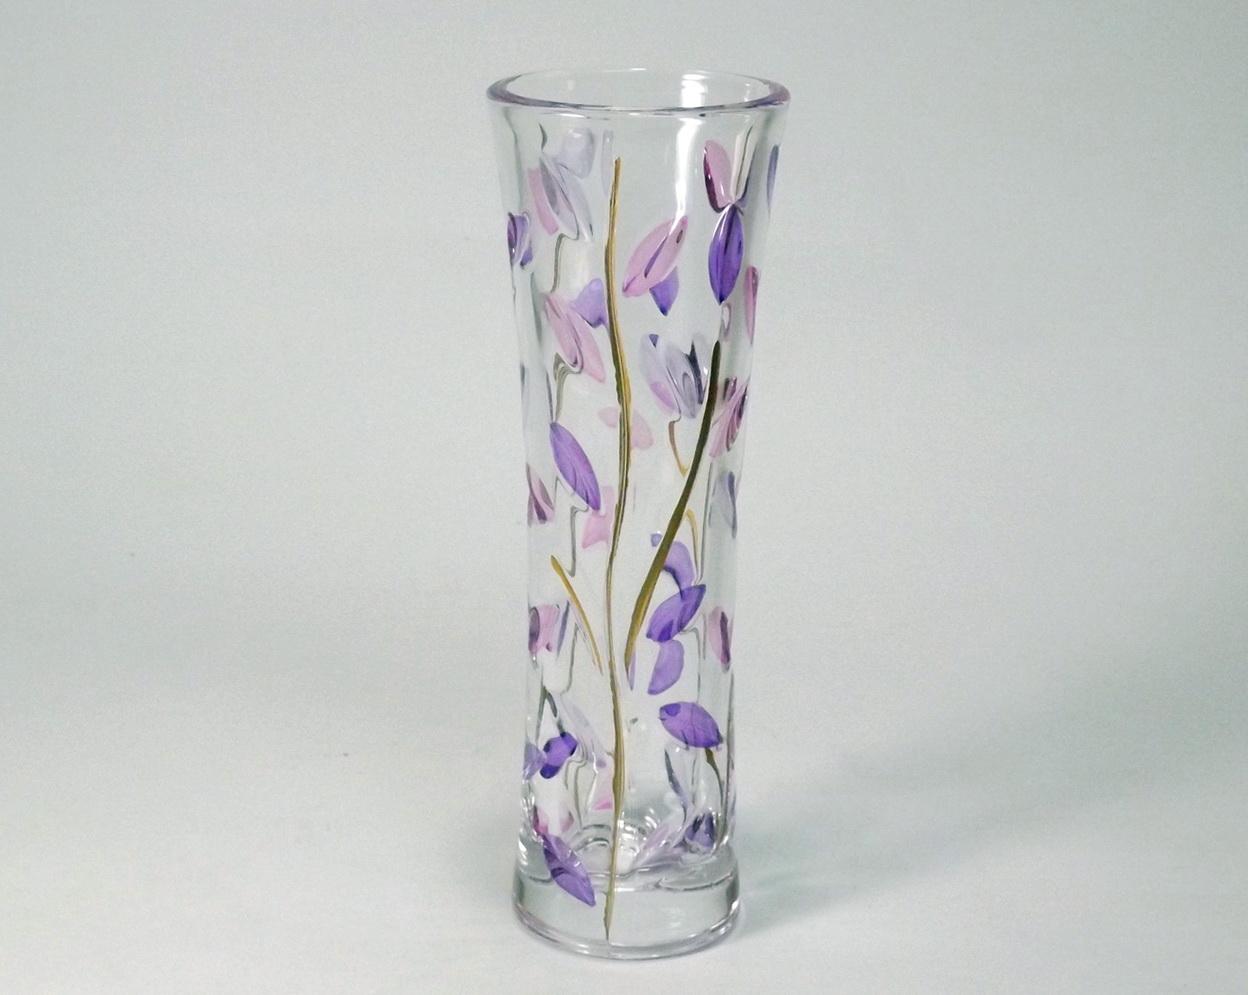 Wholesale Glass Vases Dallas Tx